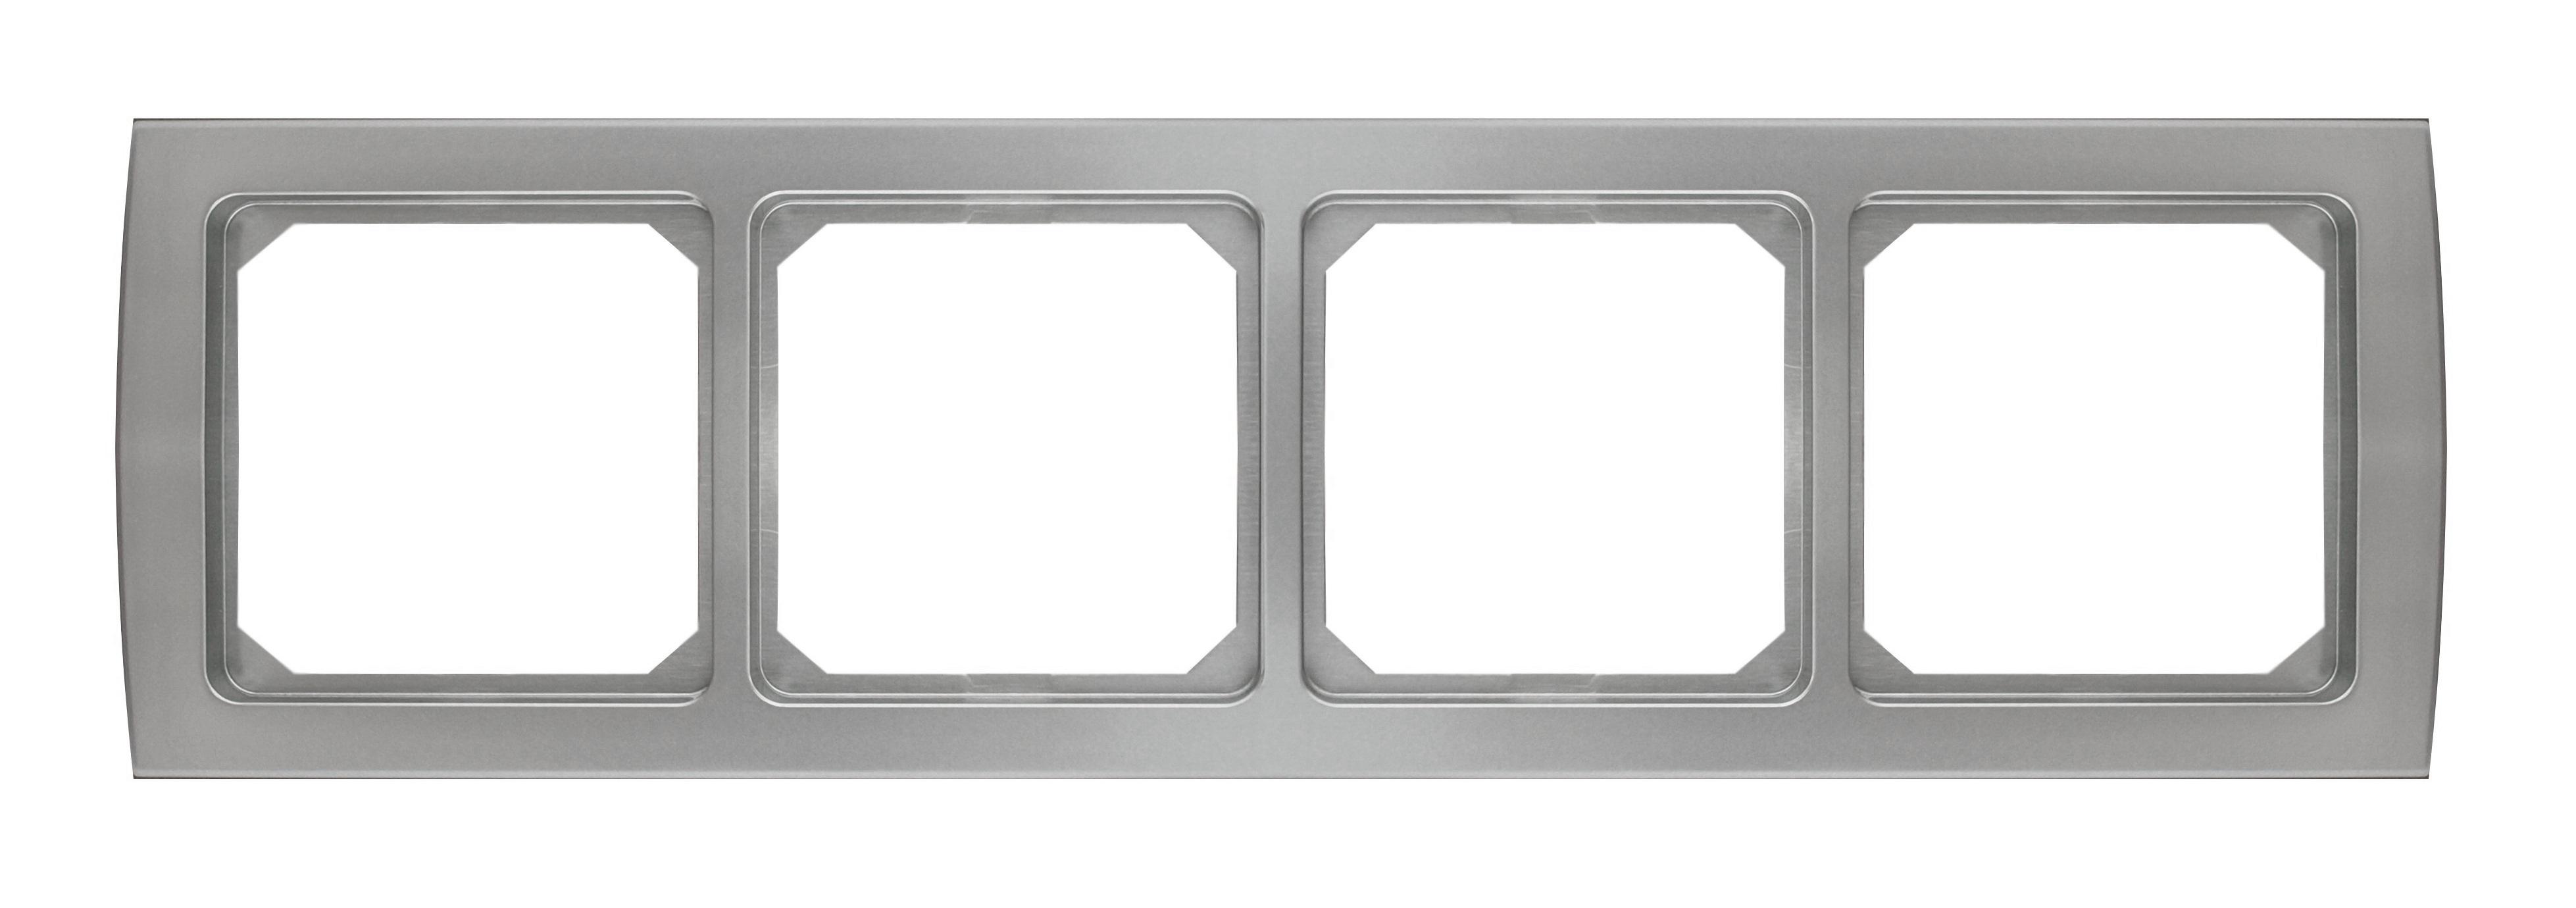 1 Stk Rahmen 4-fach, Edelstahleffekt Riva EL2044211-